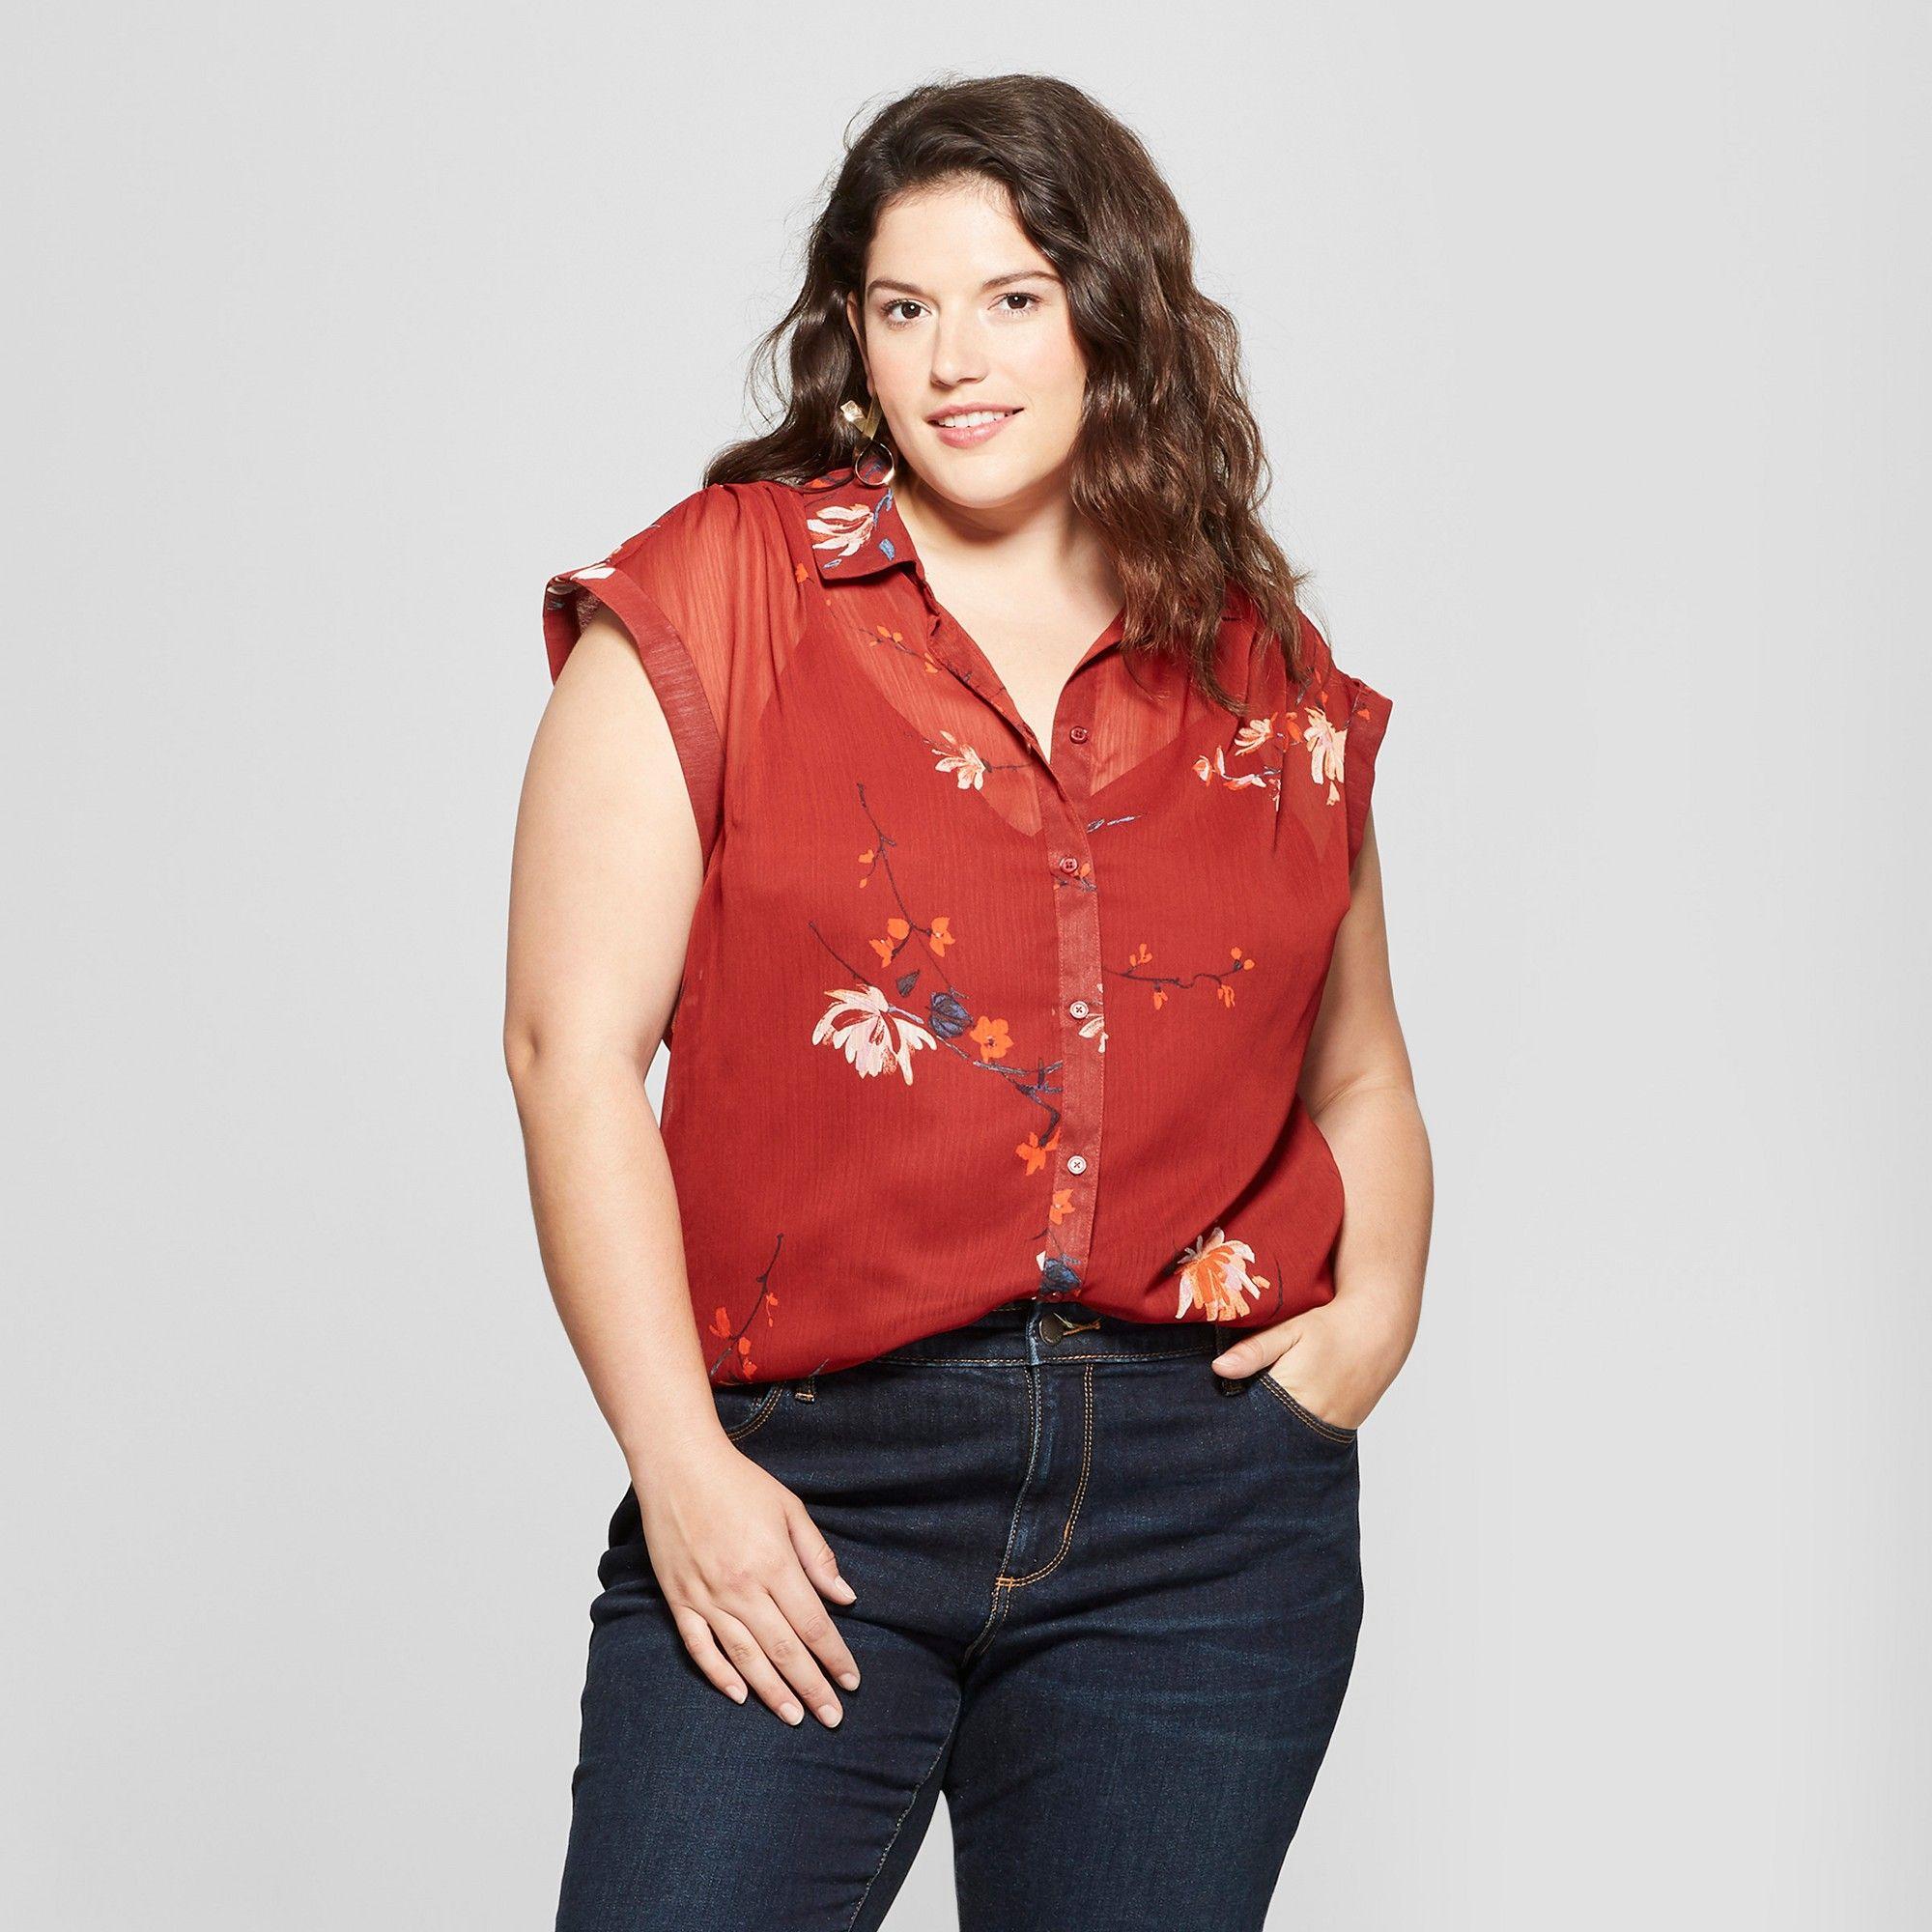 587002eab919b Women s Plus Size Floral Print Button-Down Short Sleeve Shirt - Ava   Viv  Red 2X